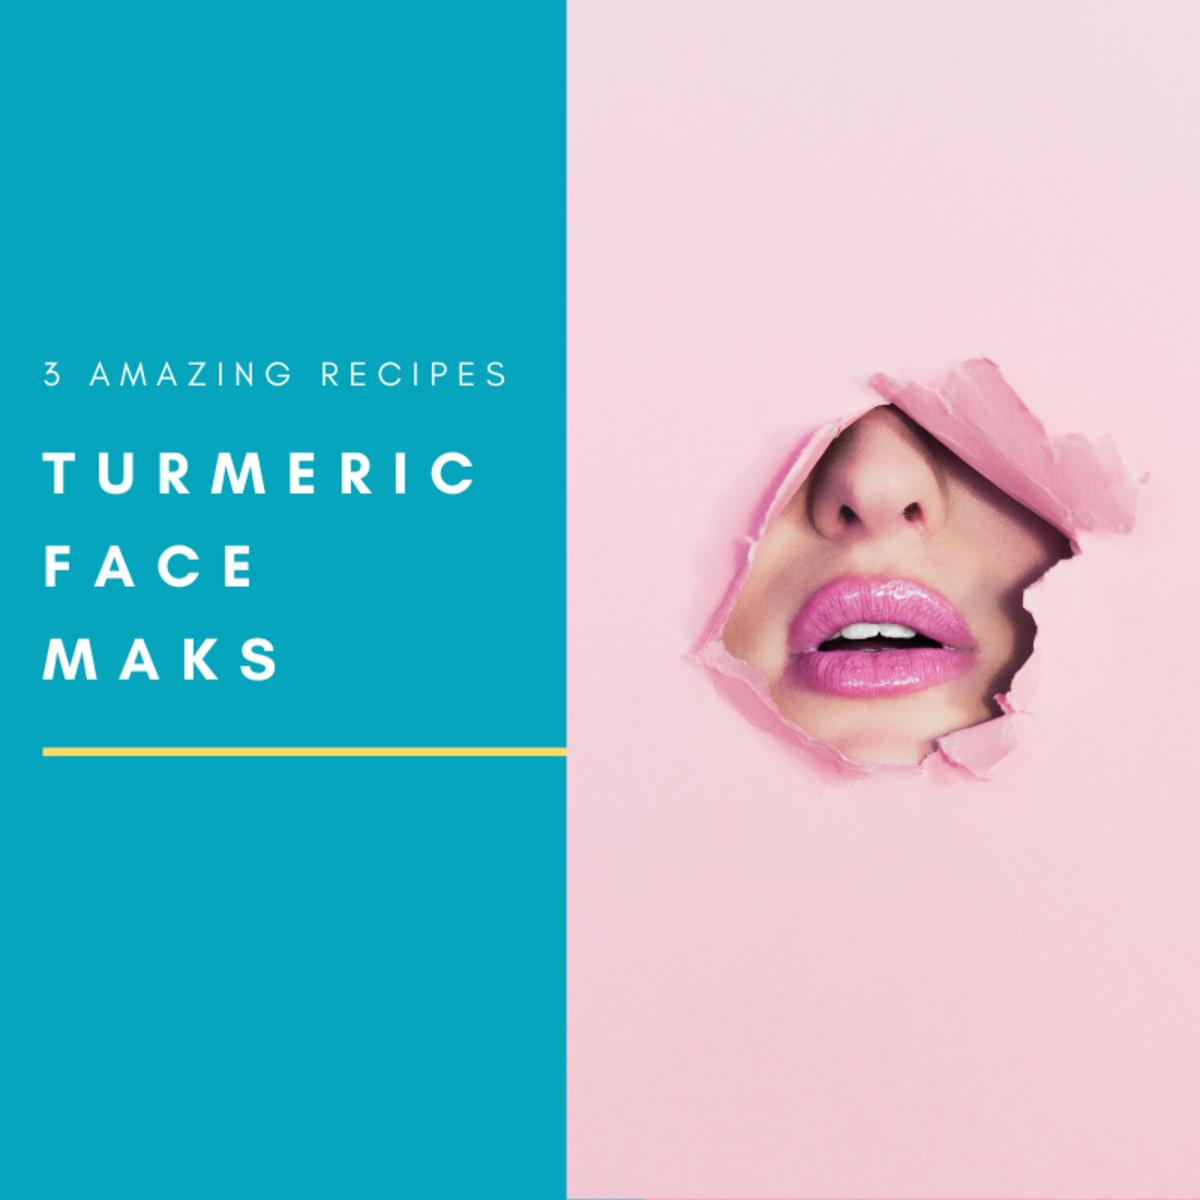 Turmeric Face Mask Recipes: True Secret to Glowing Skin